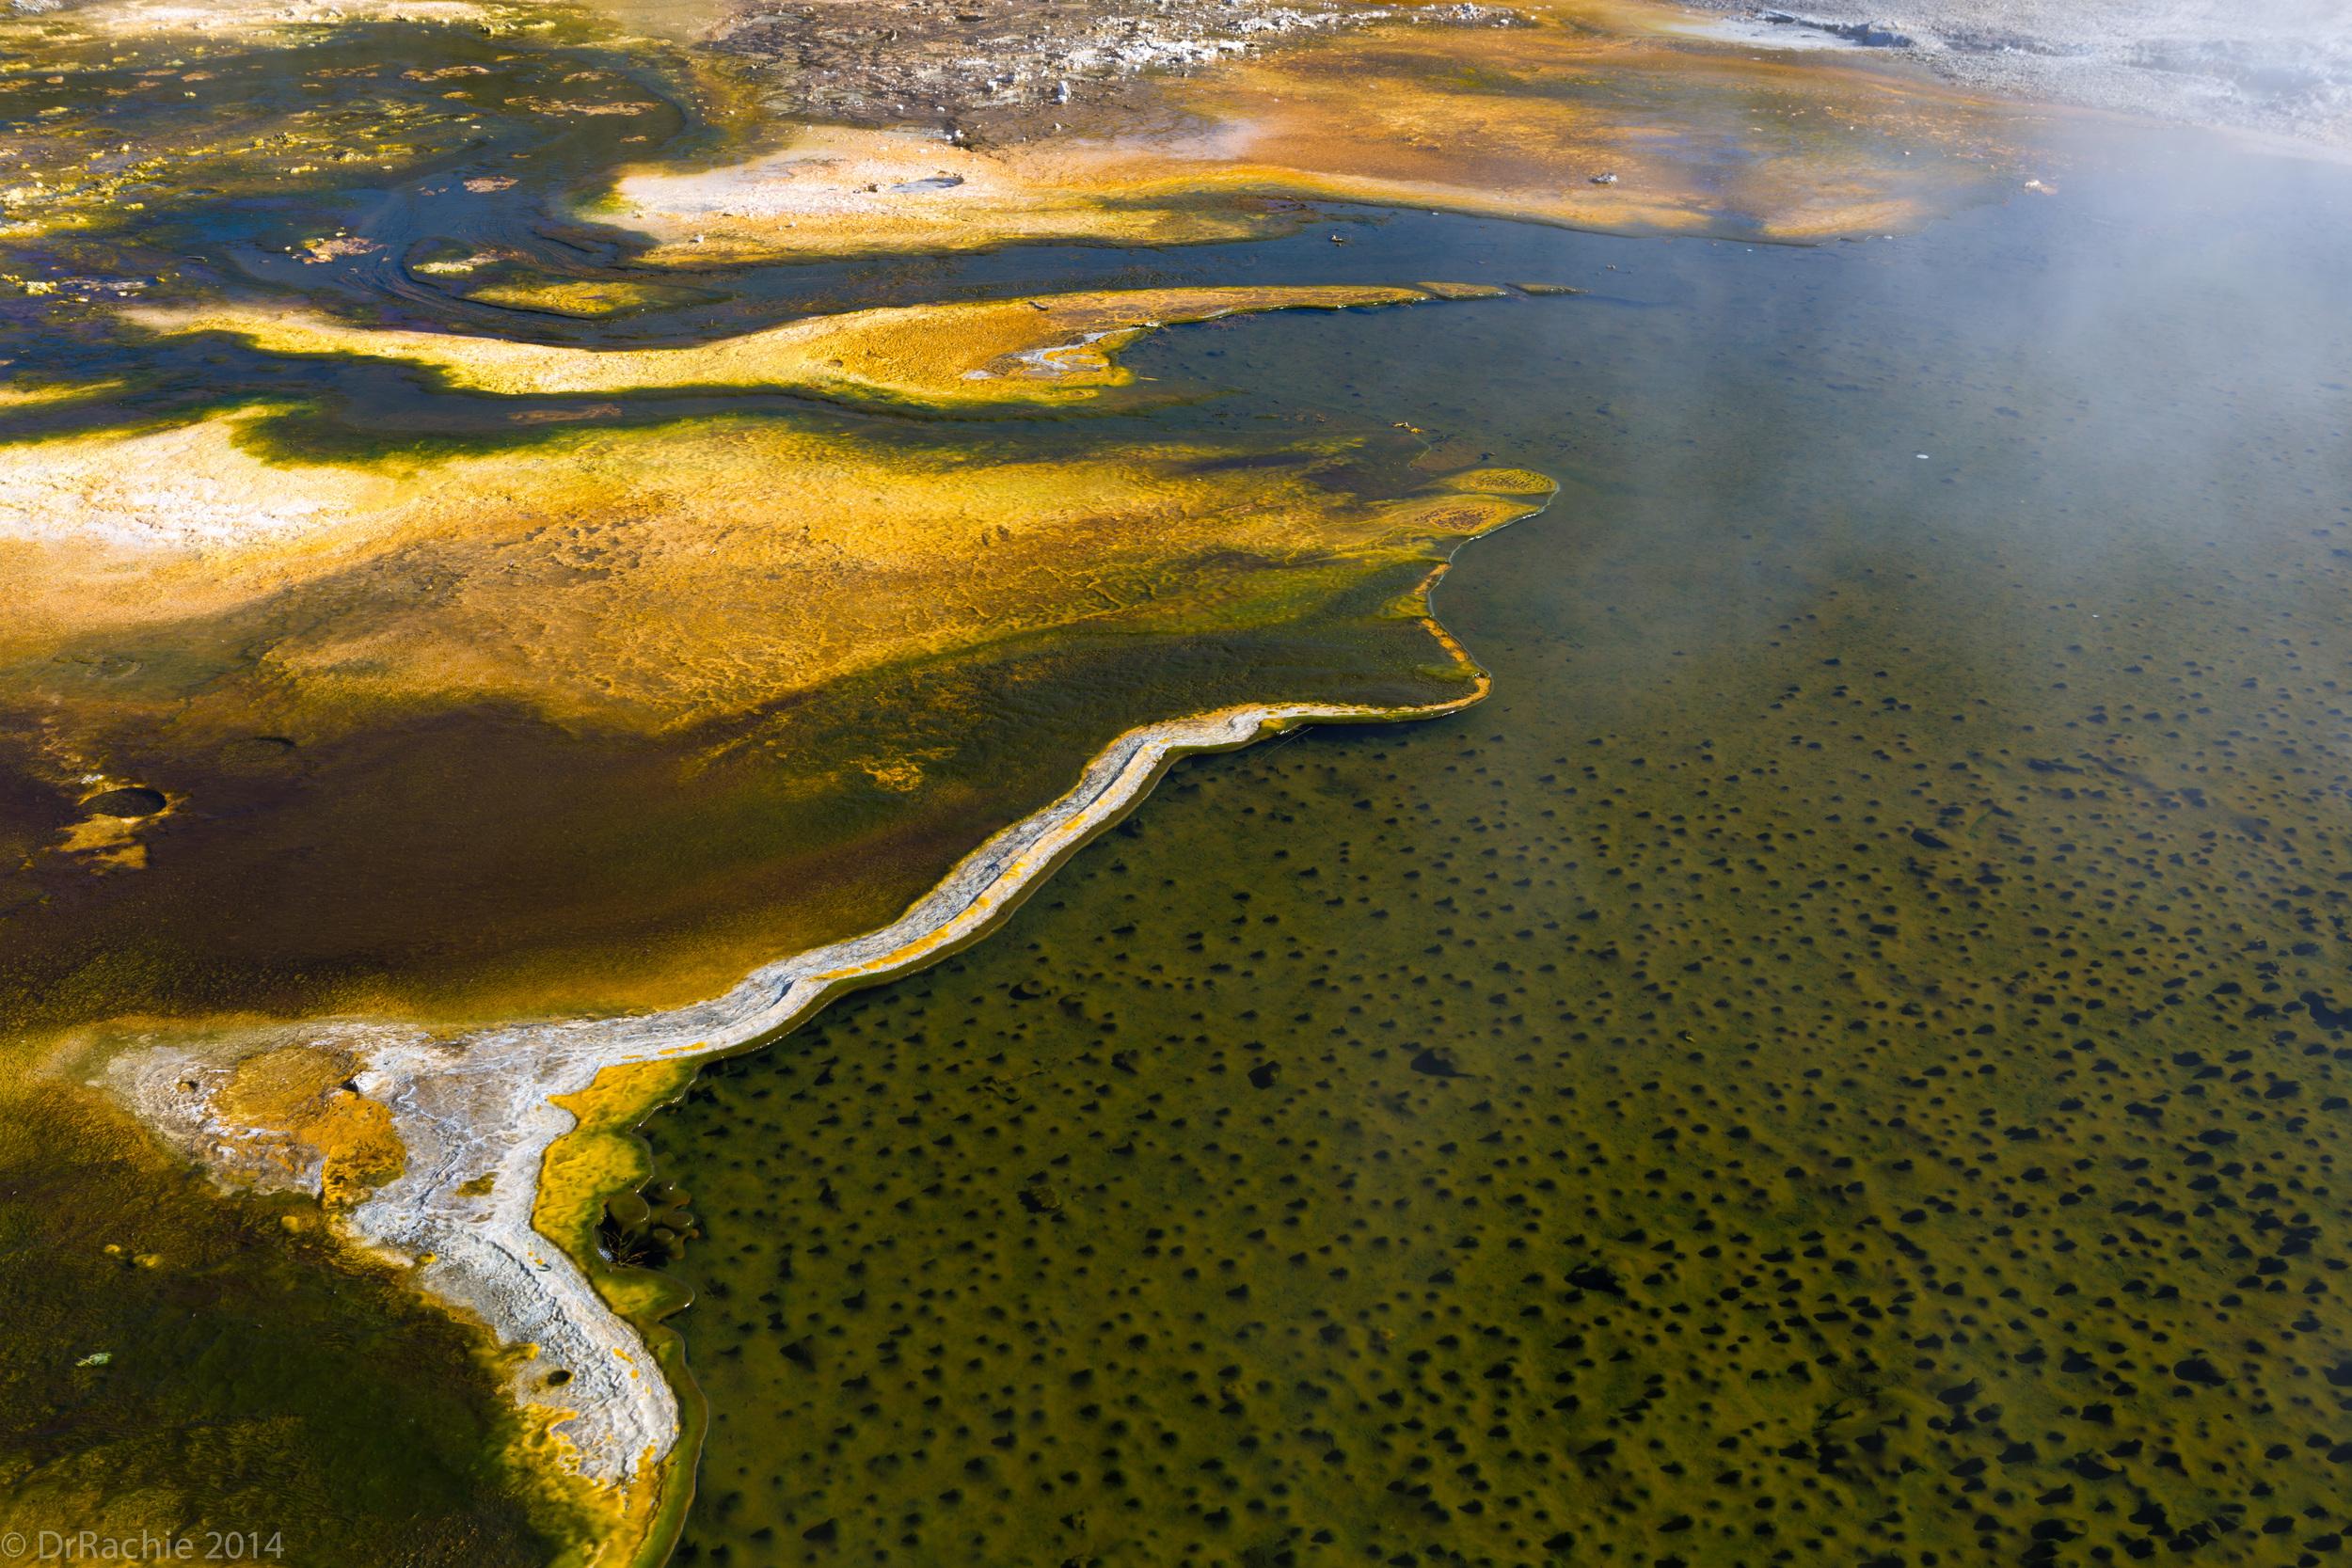 cyanobacterial-mats-yellowstone-national-park_15655621896_o.jpg